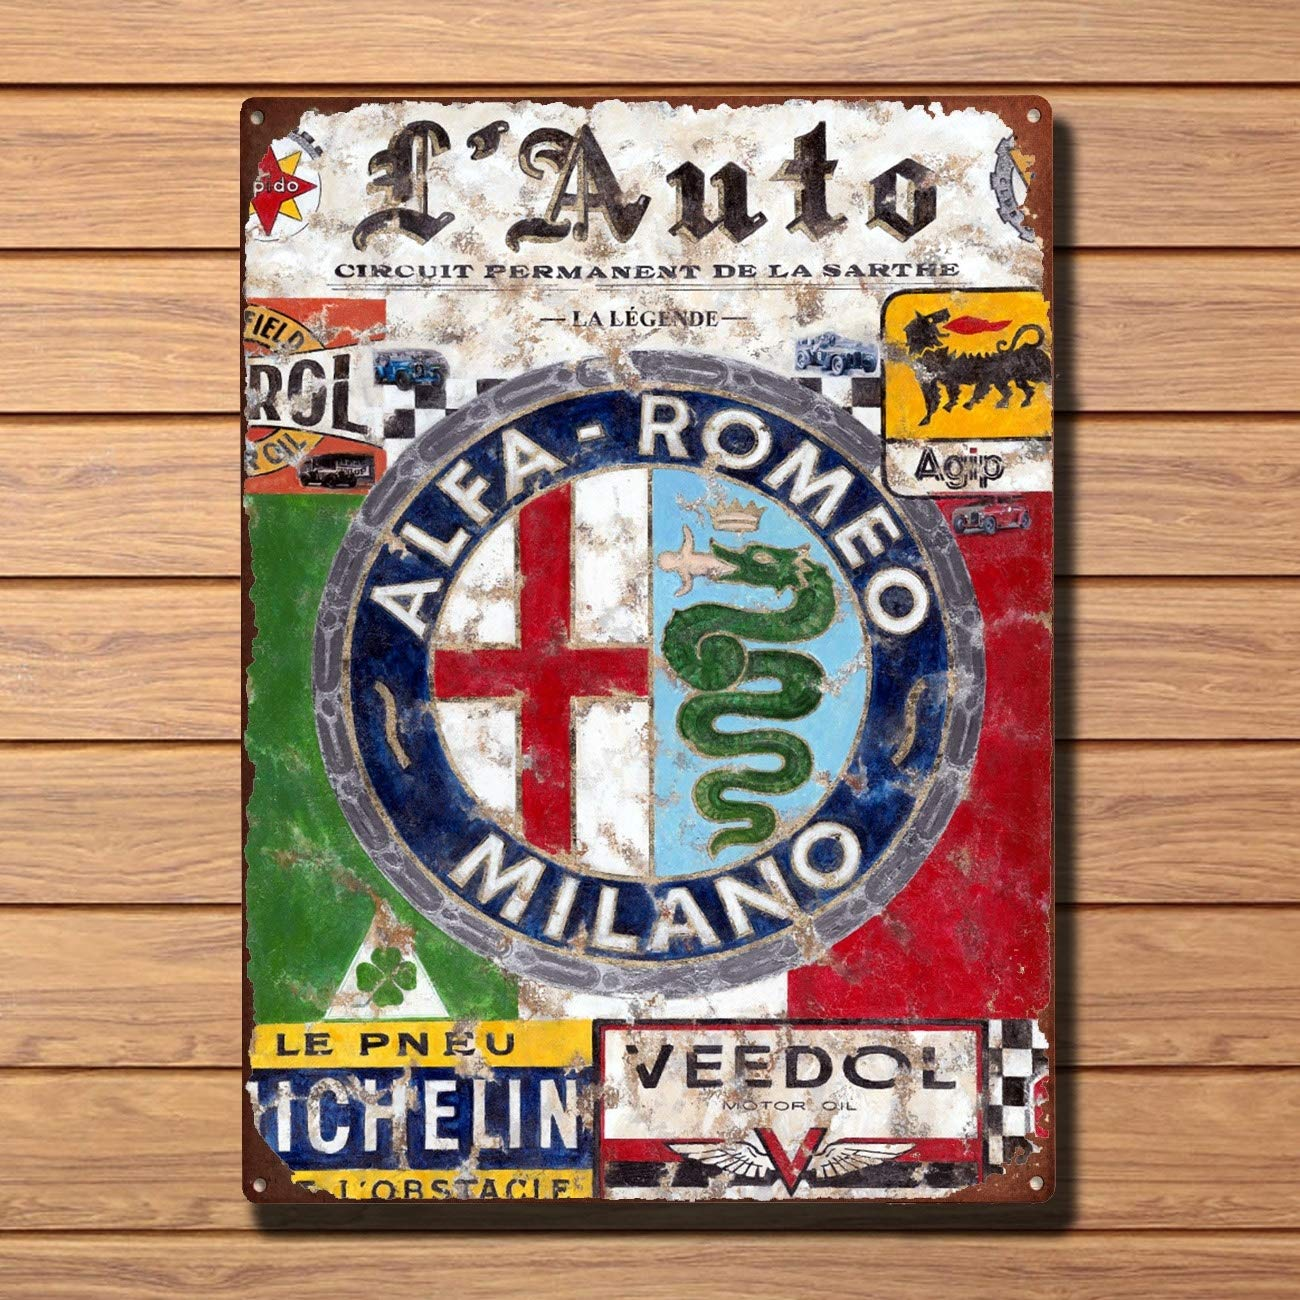 Metal Vintage Shabby-Chic Alfa Romeo Plaque Vintage Metal Tin Sign Retro Tin Plate Sign Wall Art Decor TIN Sign 7.8X11.8 INCH